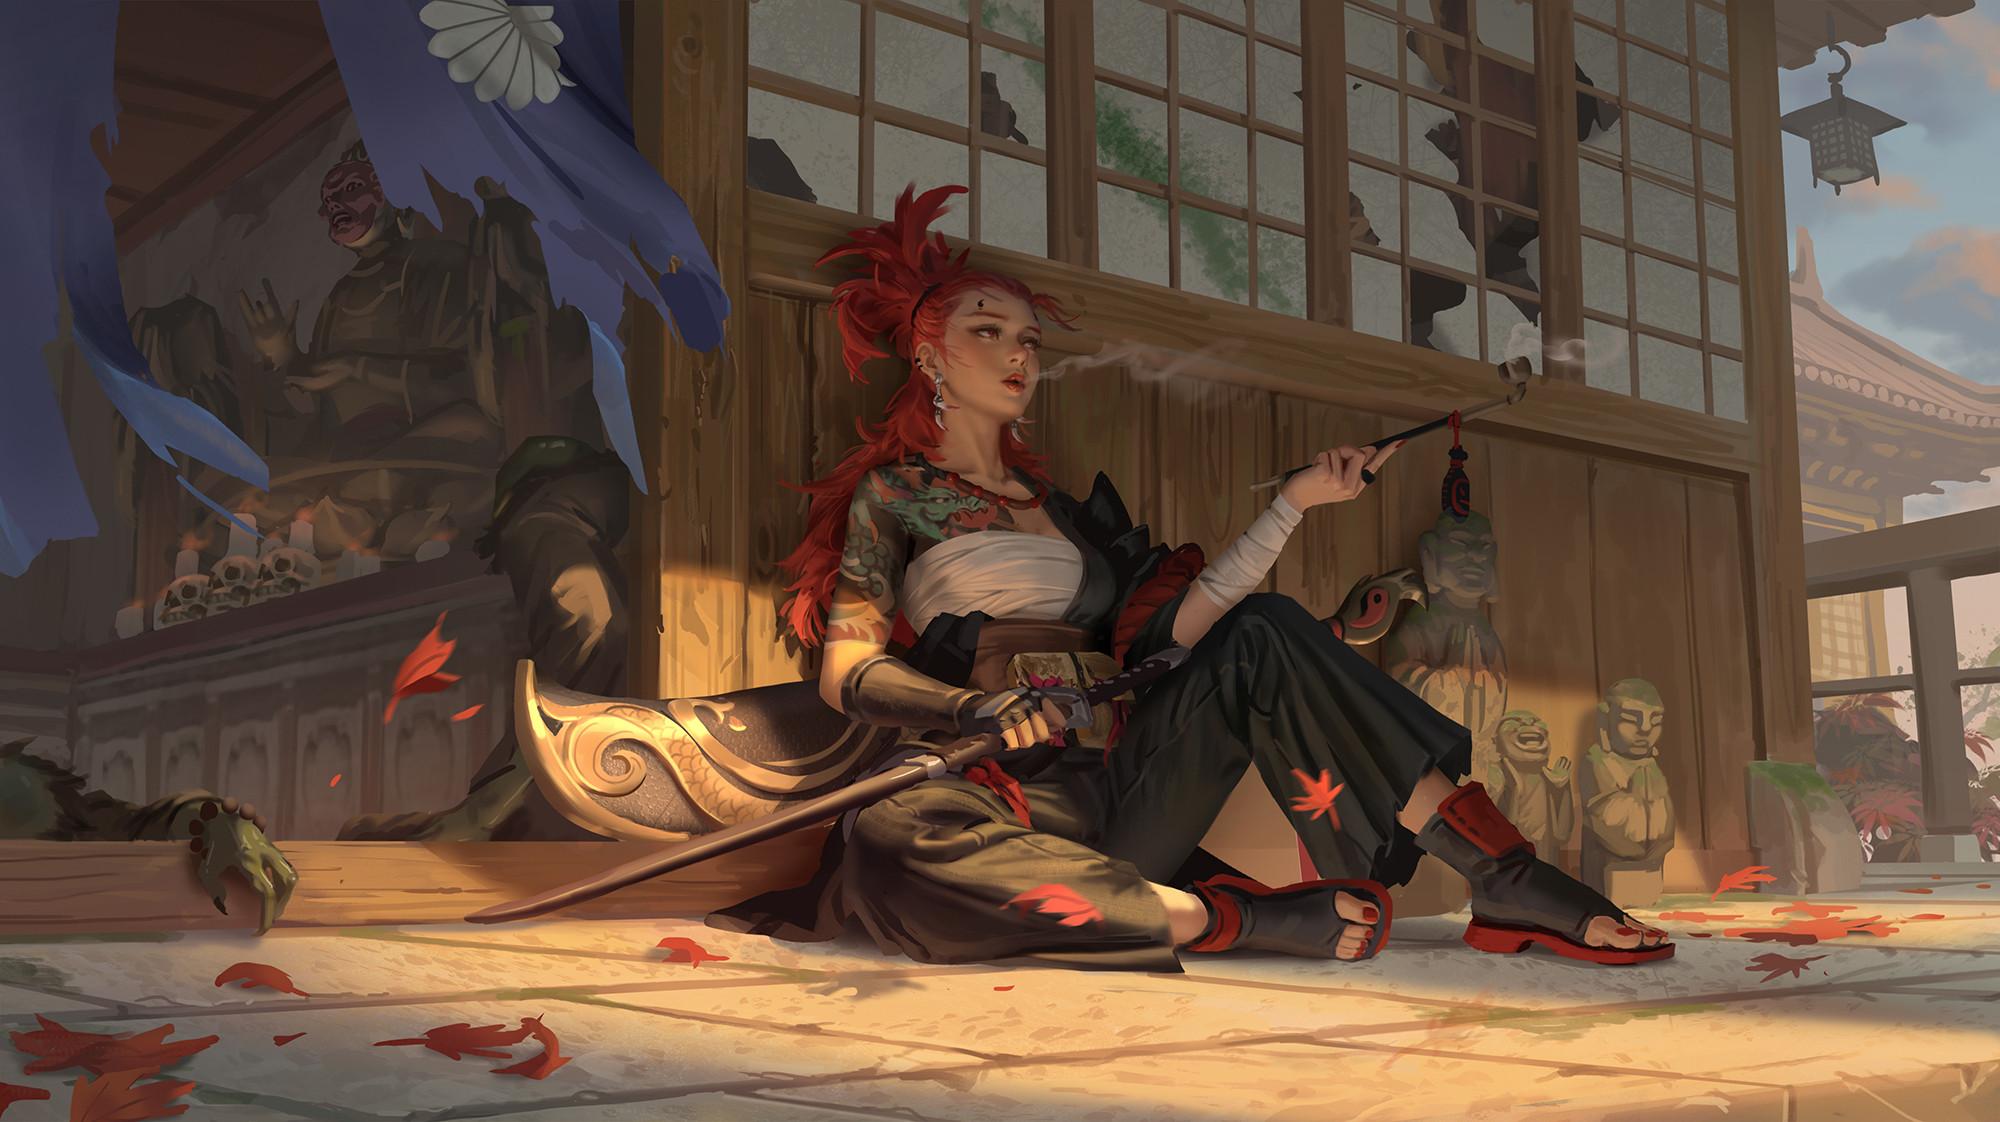 General 2000x1122 hou china digital art artwork digital painting women sword pipe painted nails redhead tattoo leaves Buddha sculpture skull fictional character